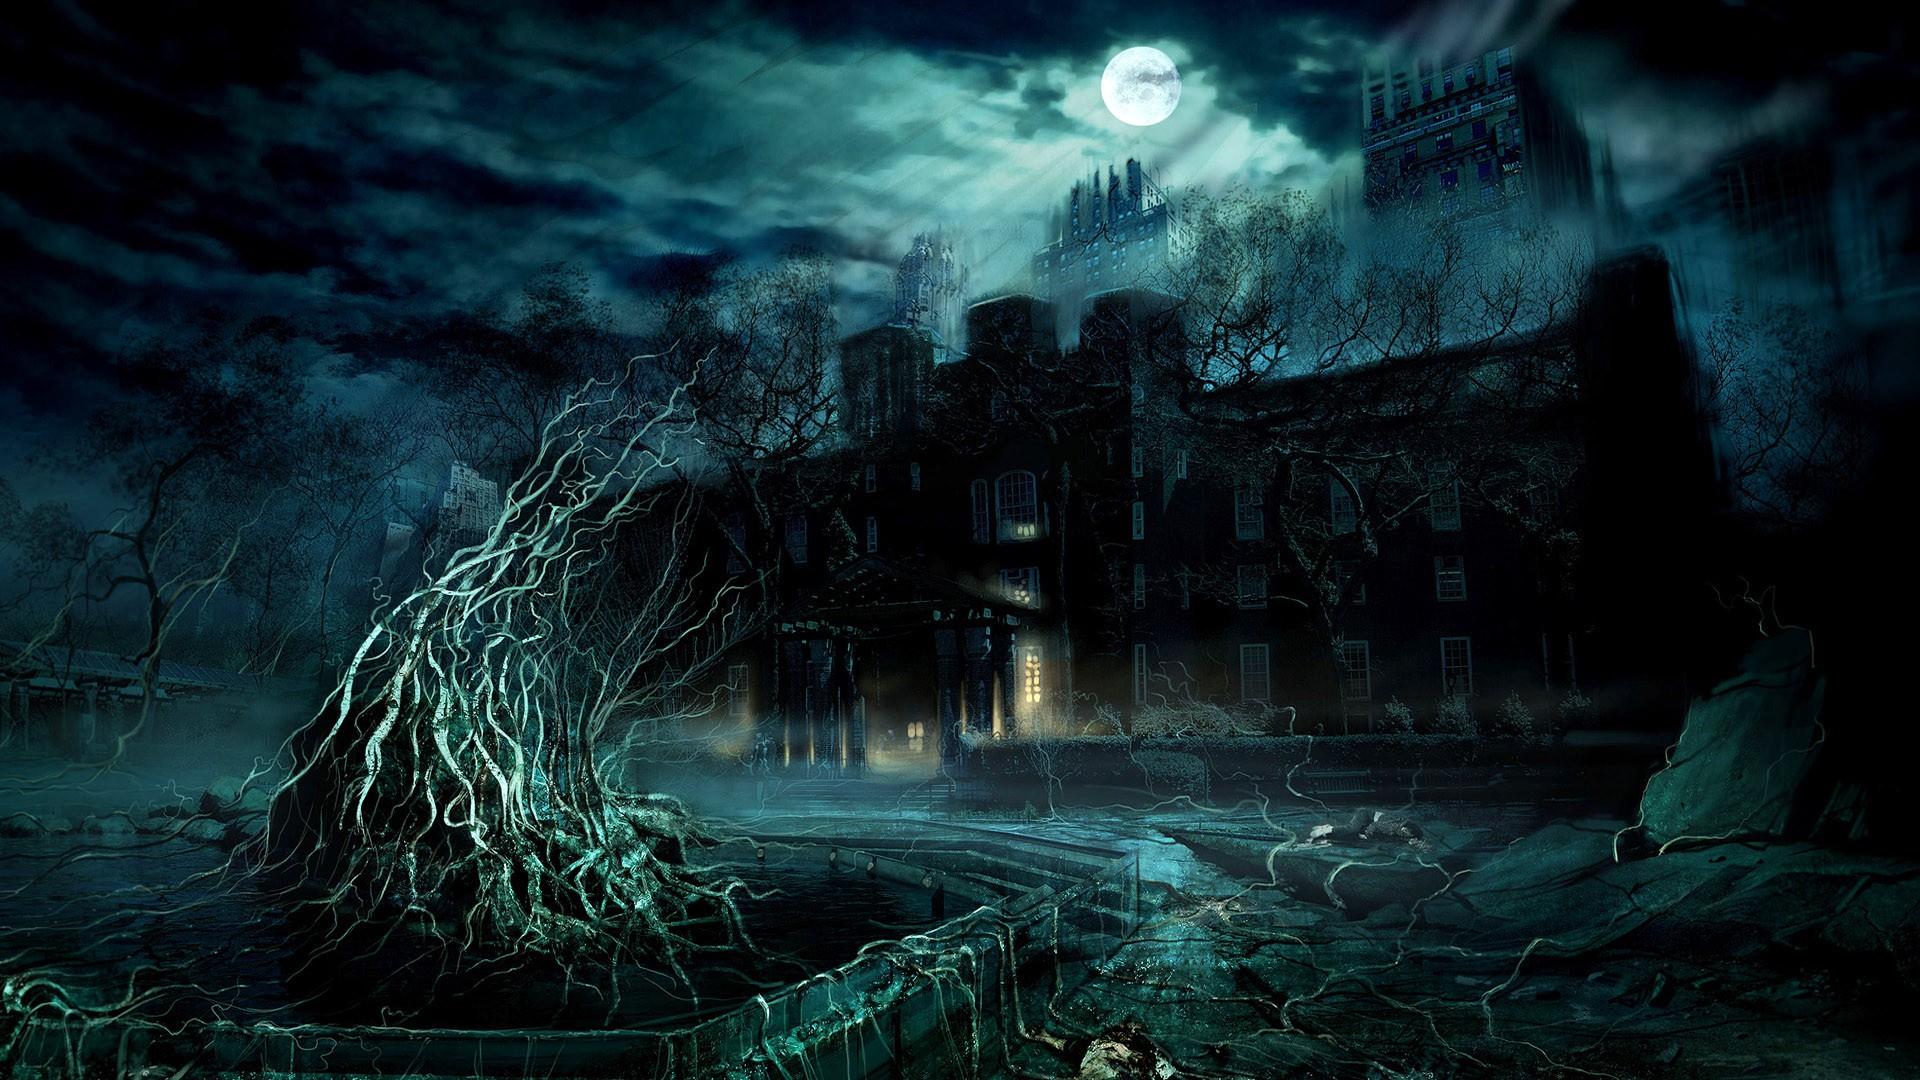 Most Inspiring Wallpaper Night Ghost - night-horror-artwork-Moon-midnight-ghost-ship-chateau-darkness-screenshot-computer-wallpaper-177322  Gallery-78944.jpg